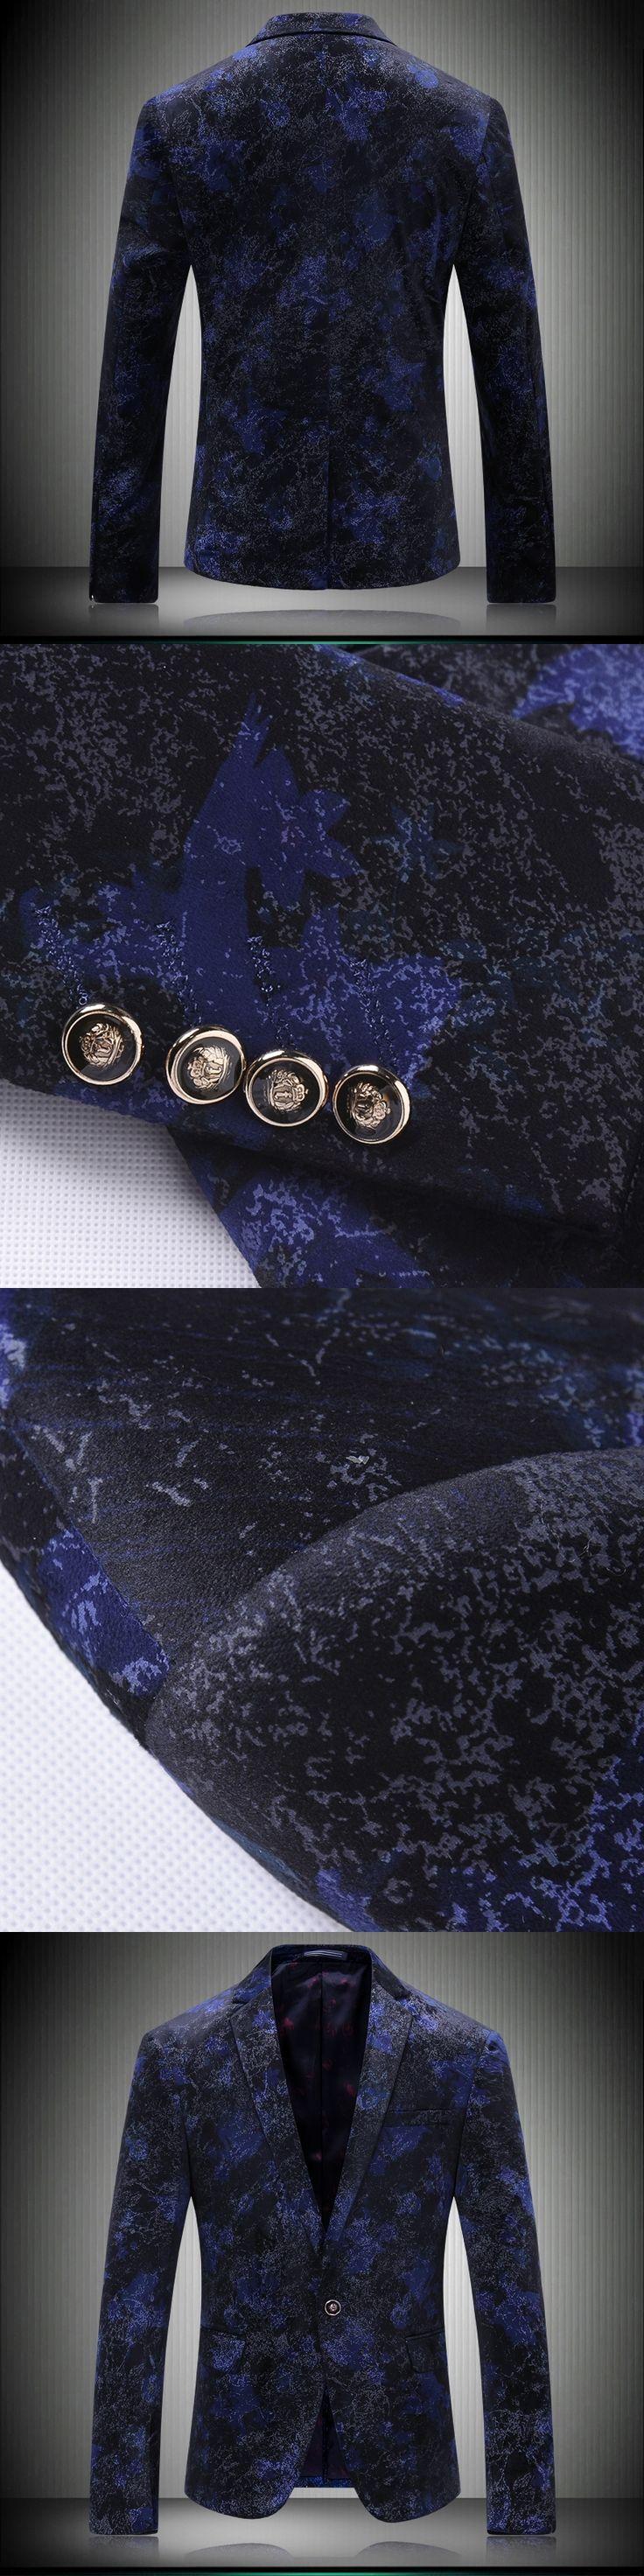 2017 Blazer Mens Slim Fit Royal Blue Blazer Hombre Brand-clothing Jaquetas Masculinas Latest Coat Design Tuxedo Men Club Outfits